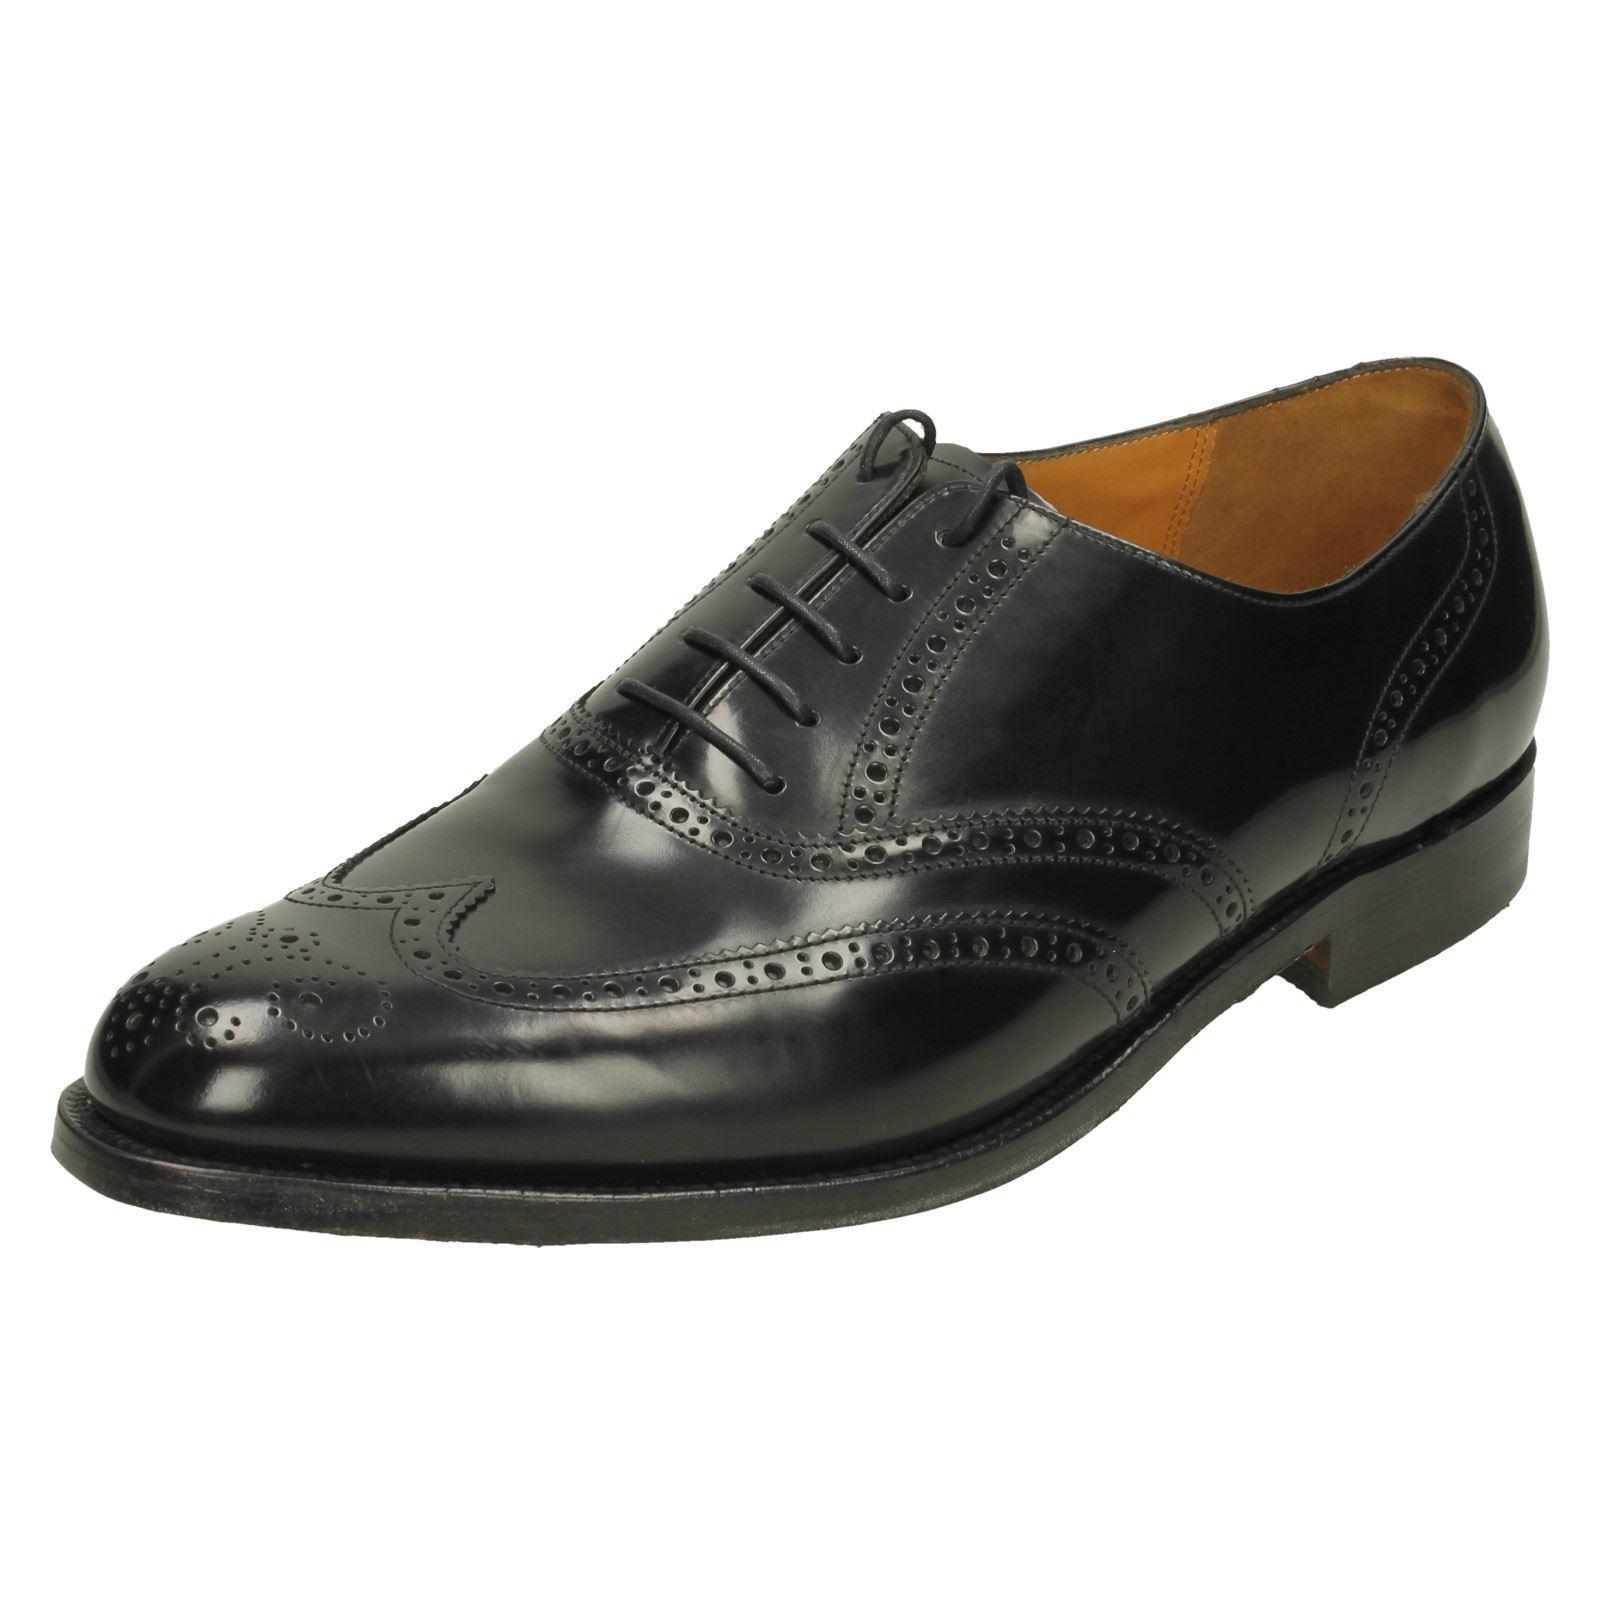 Uomo Barker Barker Barker Brogue Style Schuhes 'Albert' 520857